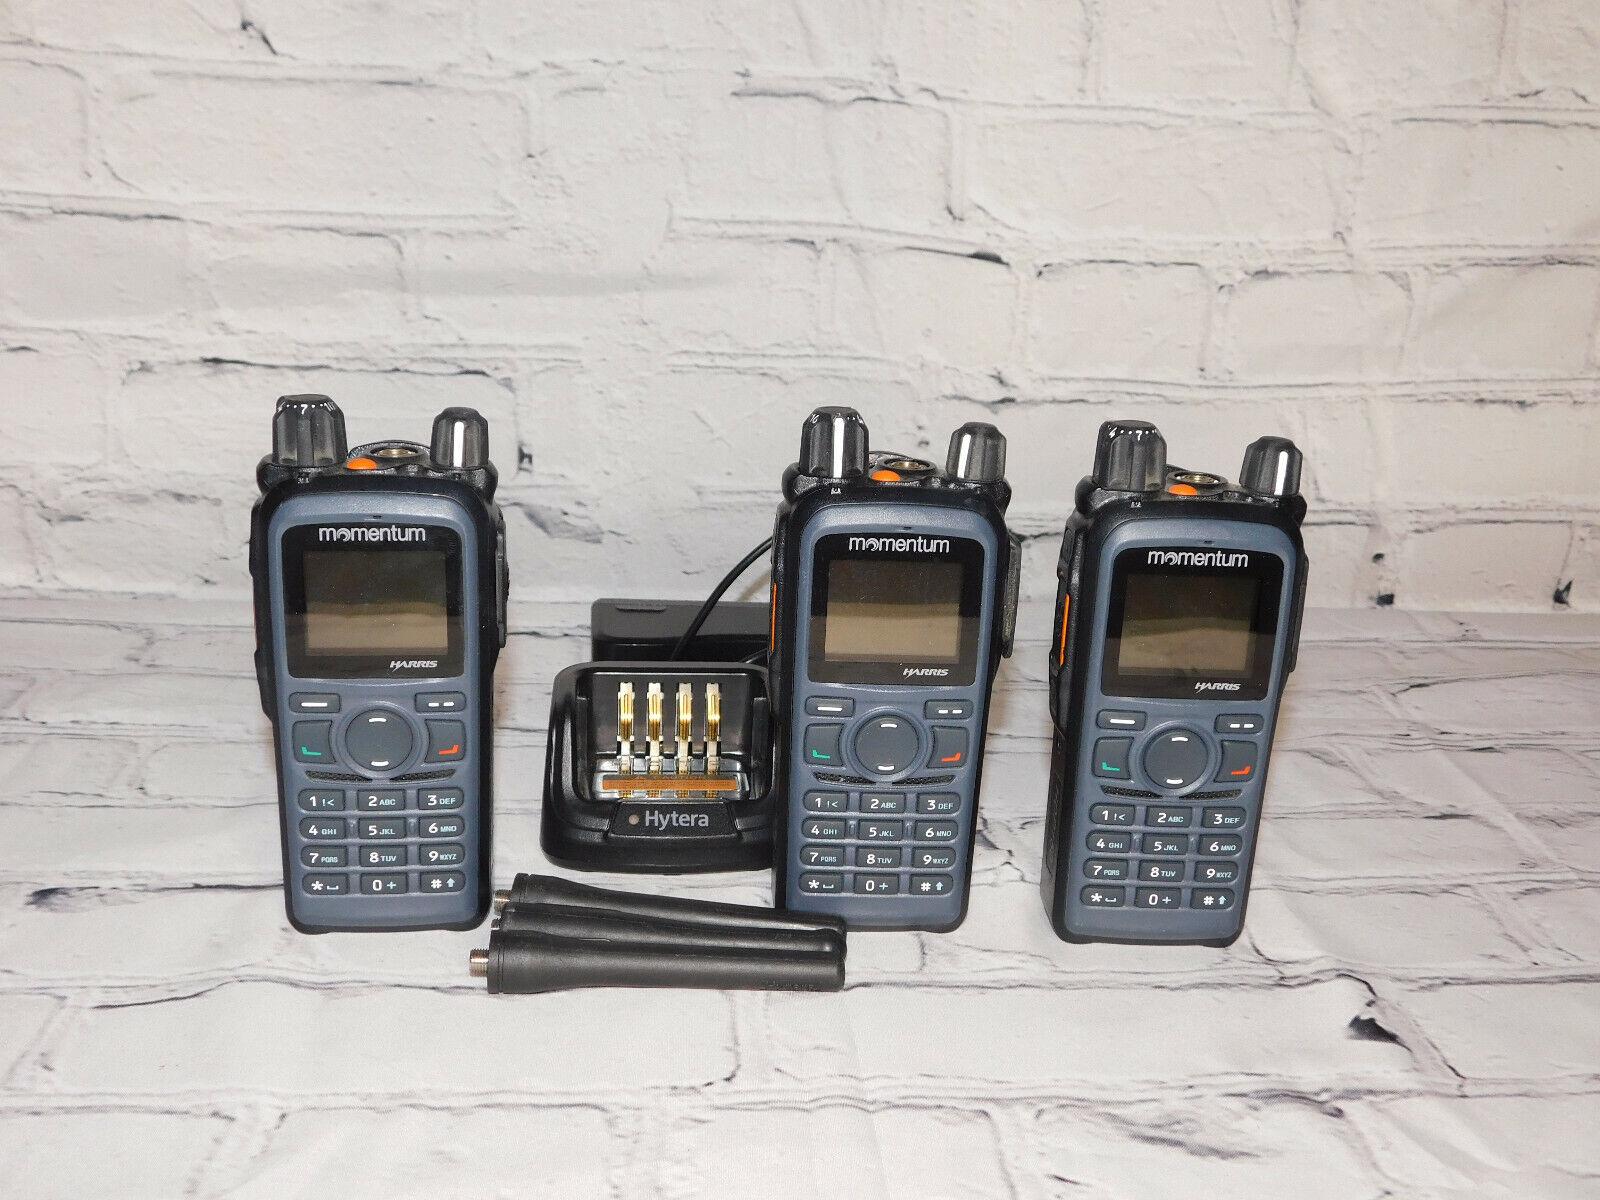 3 Harris / Hytera Momentum 403-470mhz UHF Portable Digital/analog Radios encrypt. Buy it now for 375.00